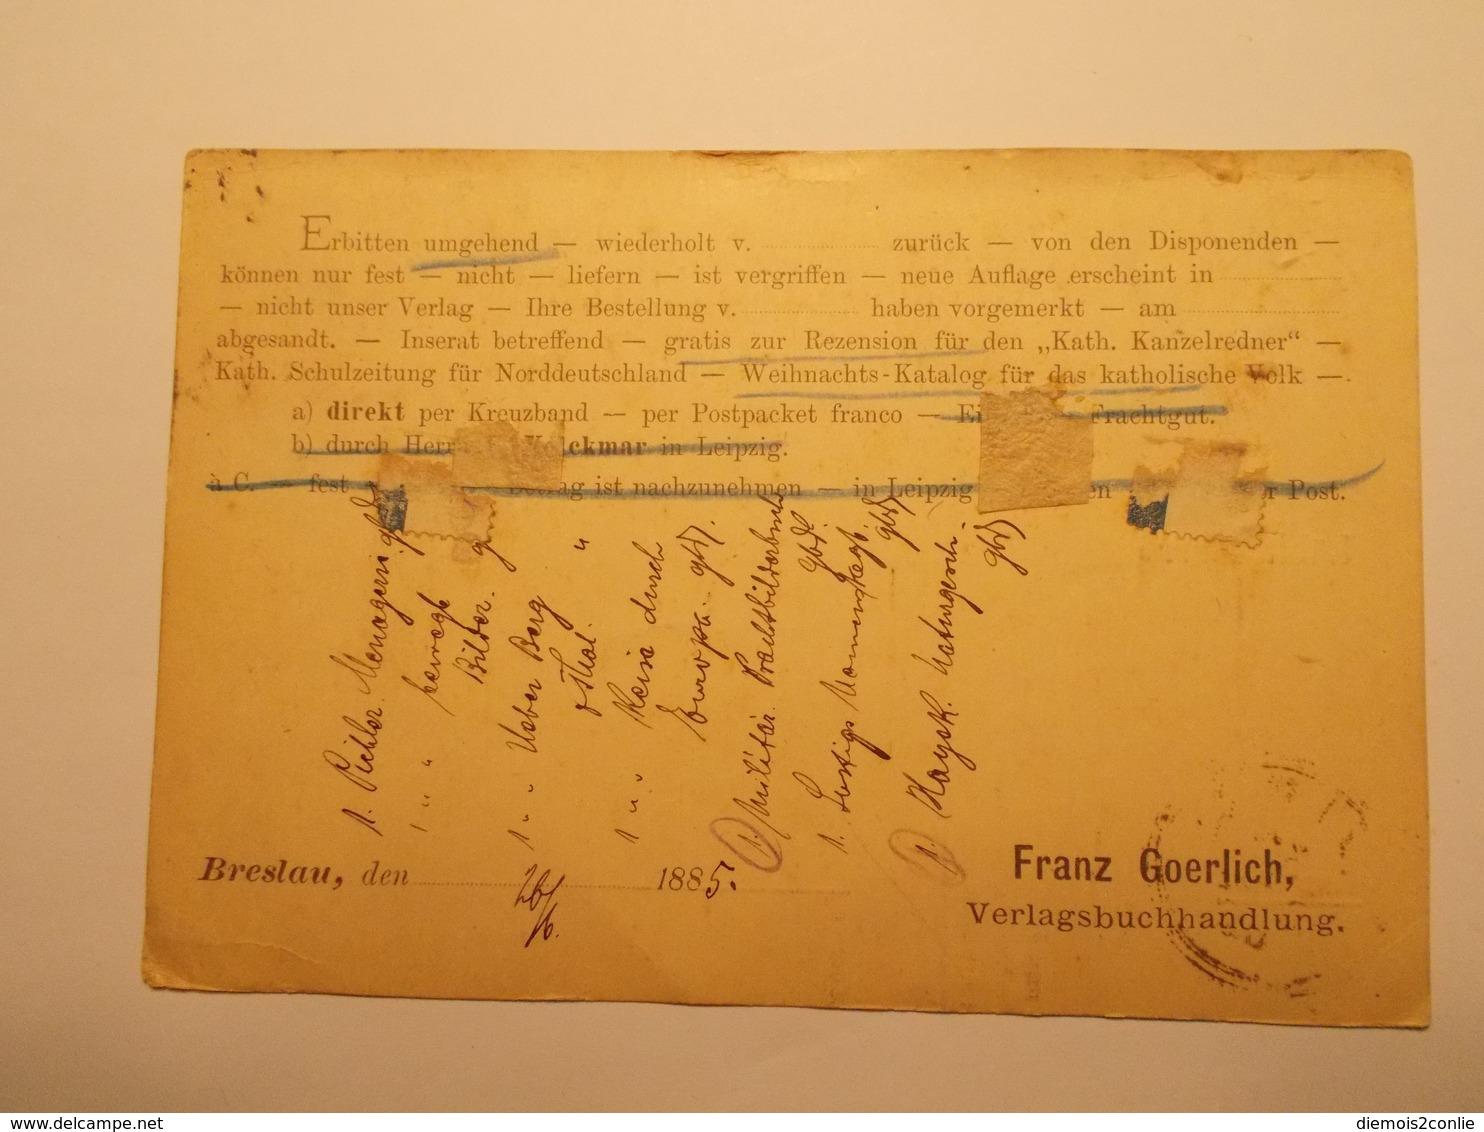 Marcophilie  Cachet Lettre Obliteration Timbres - ALLEMAGNE - Brelau - 1885 (1965) - Briefe U. Dokumente